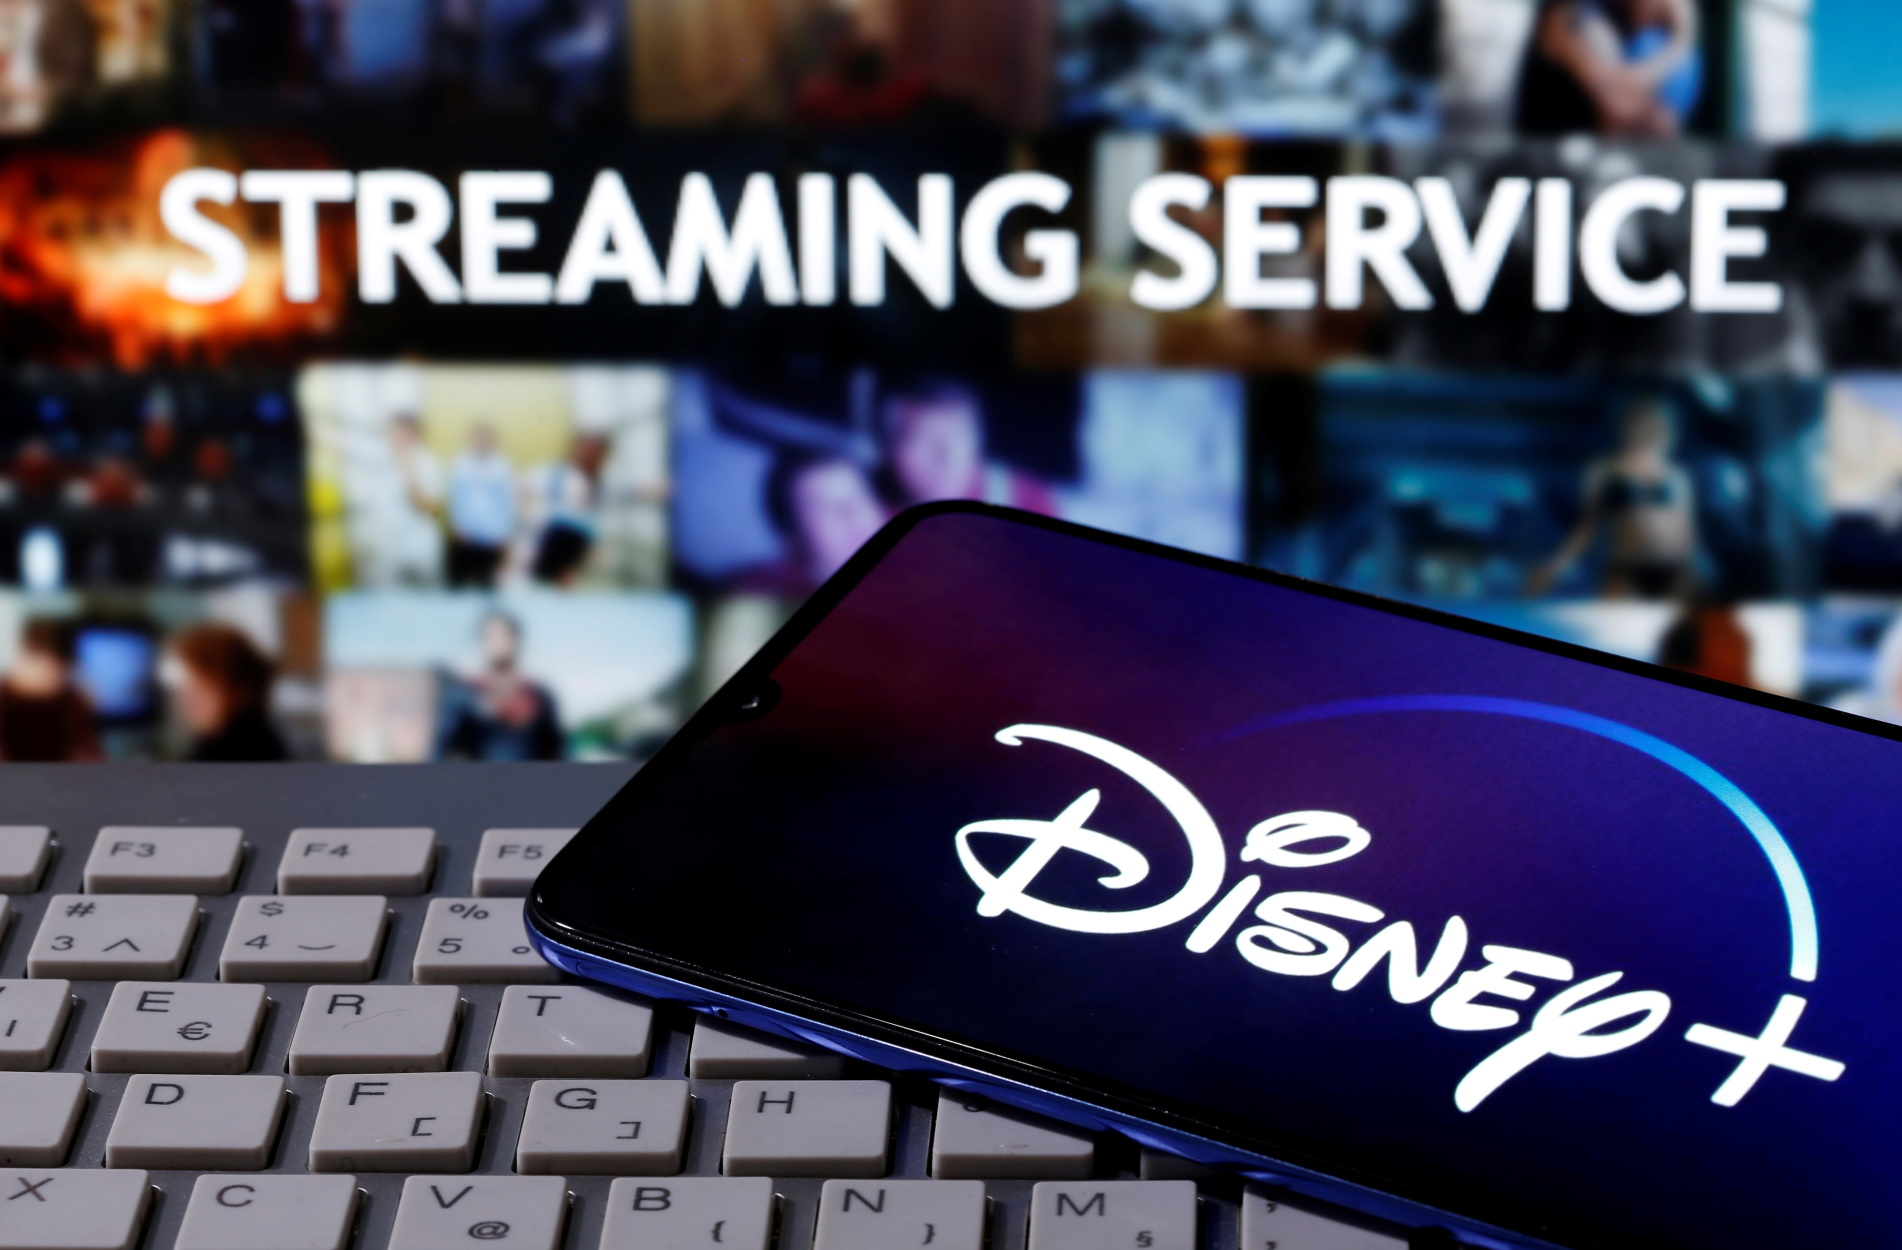 H Disney αποσύρει τον Peter Pan και άλλες σειρές και ταινίες για ρατσιστικά στερεότυπα